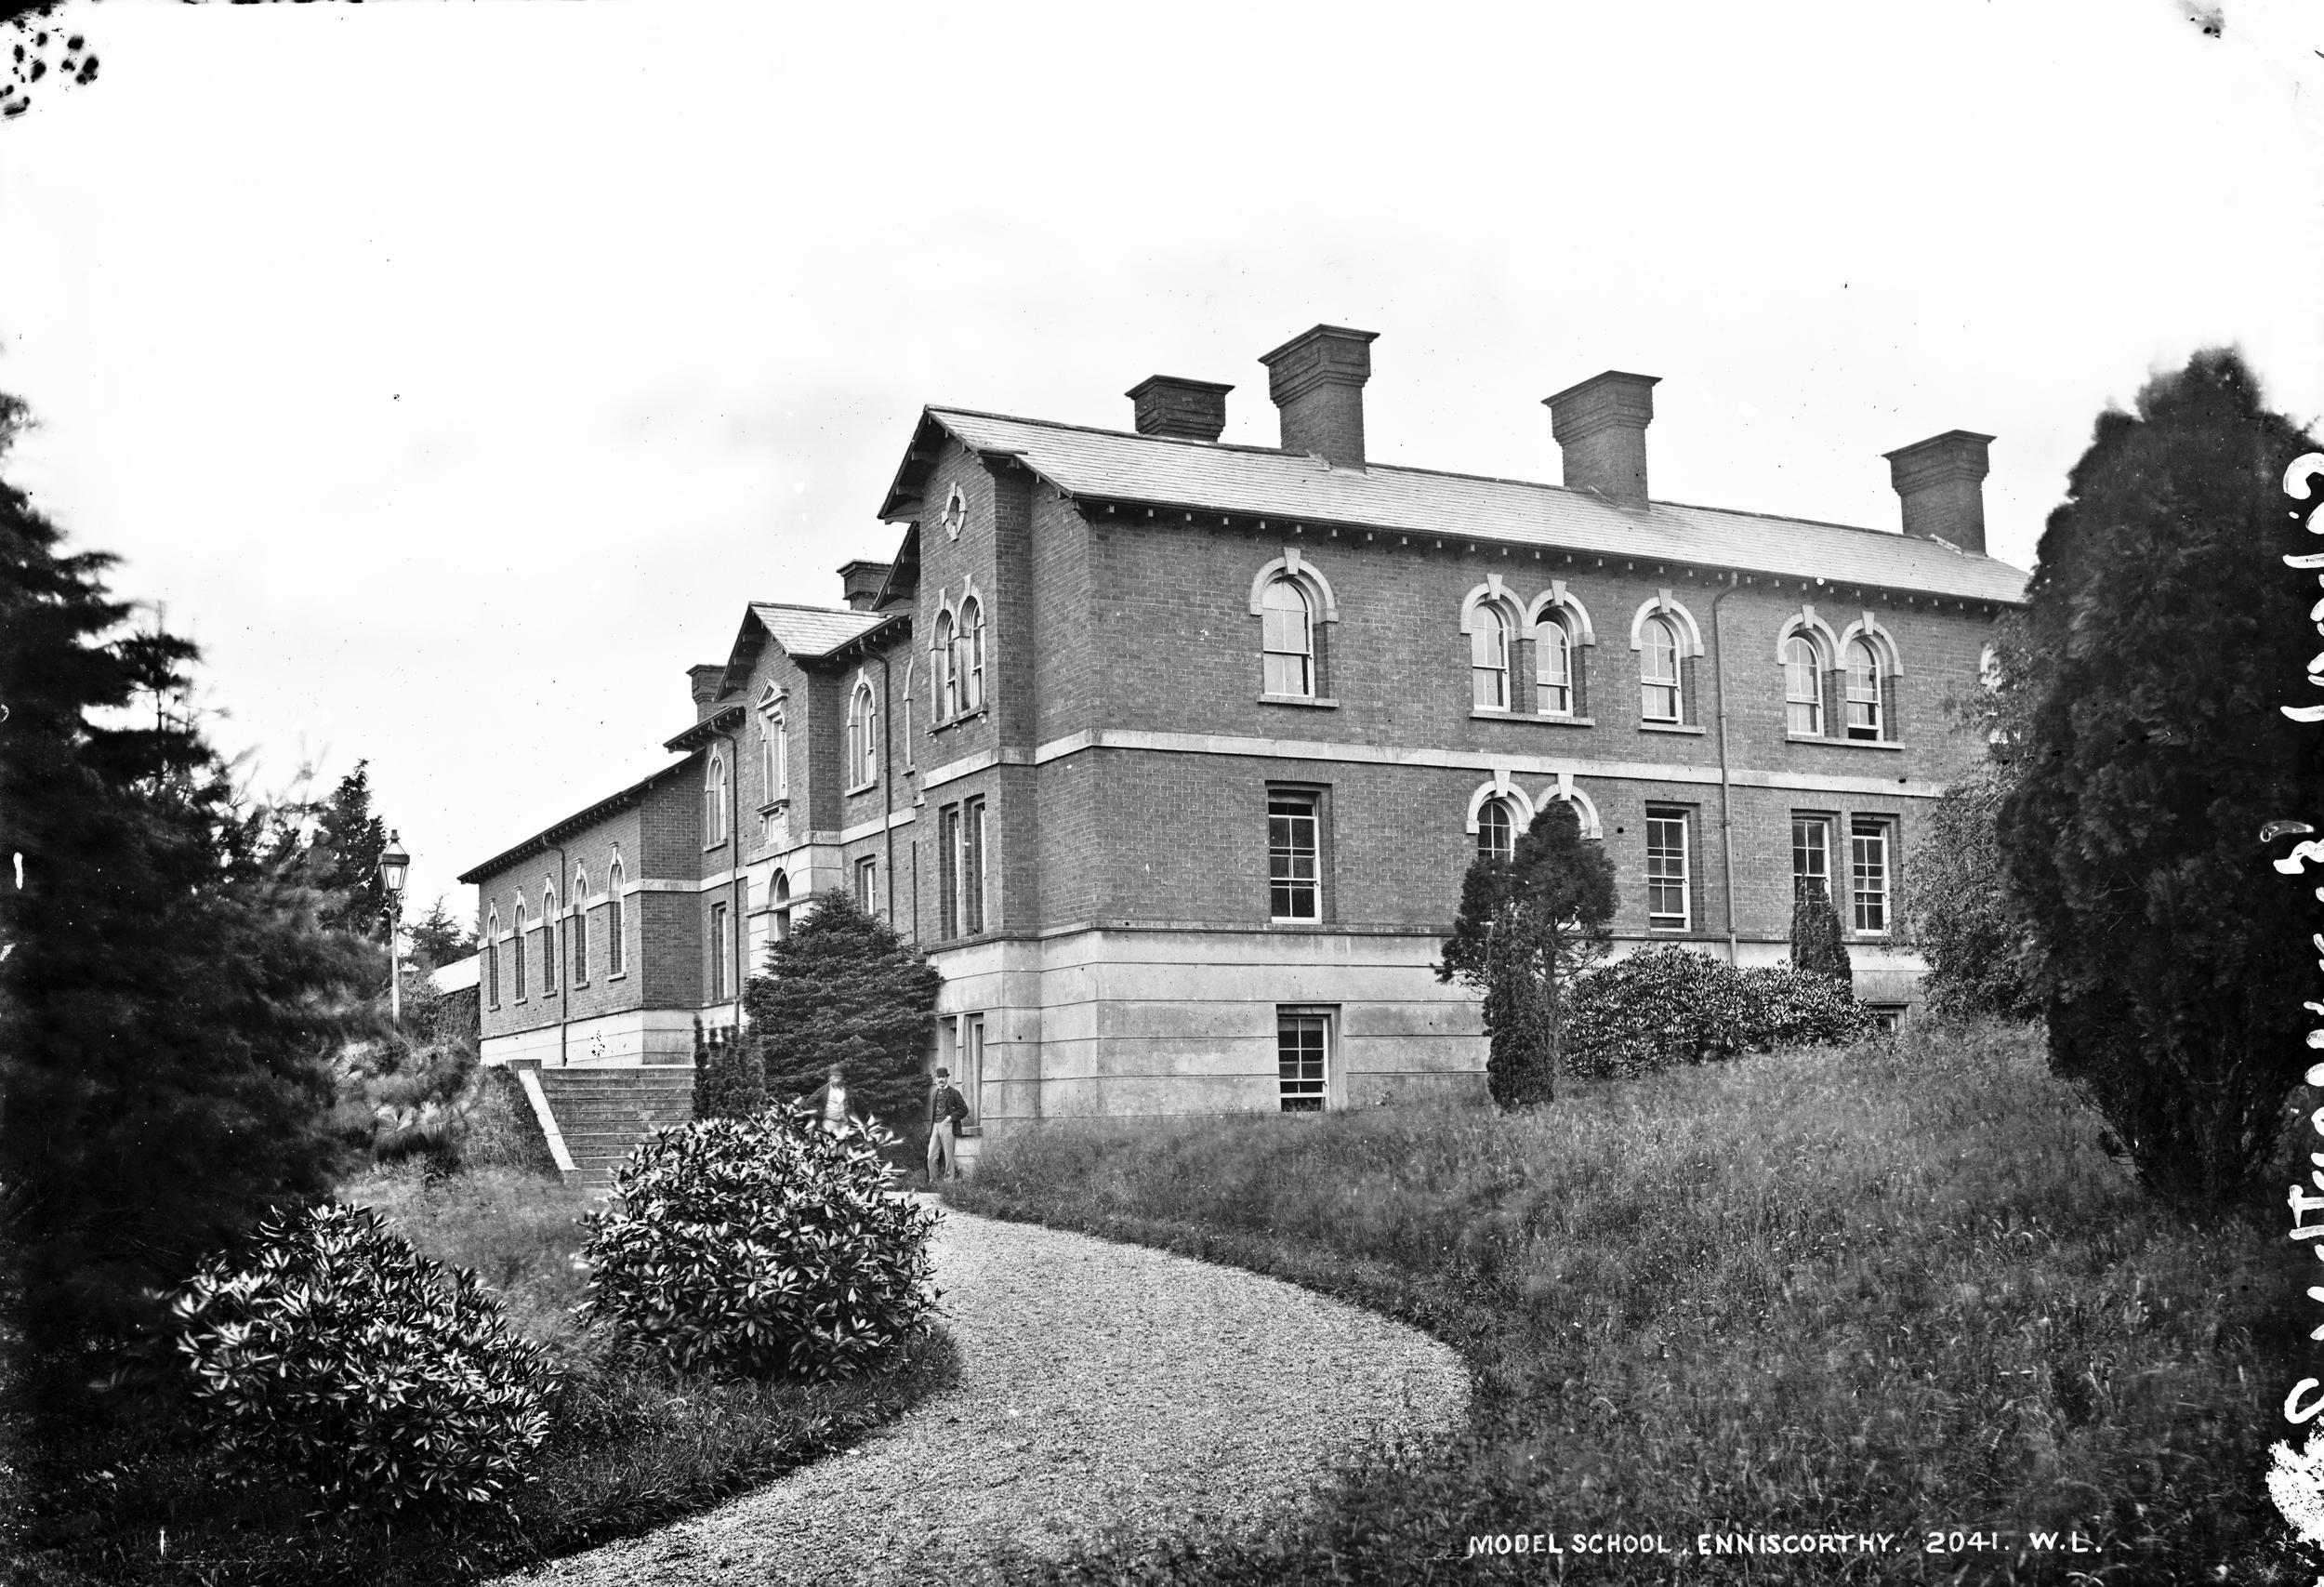 The Model School in Enniscorthy